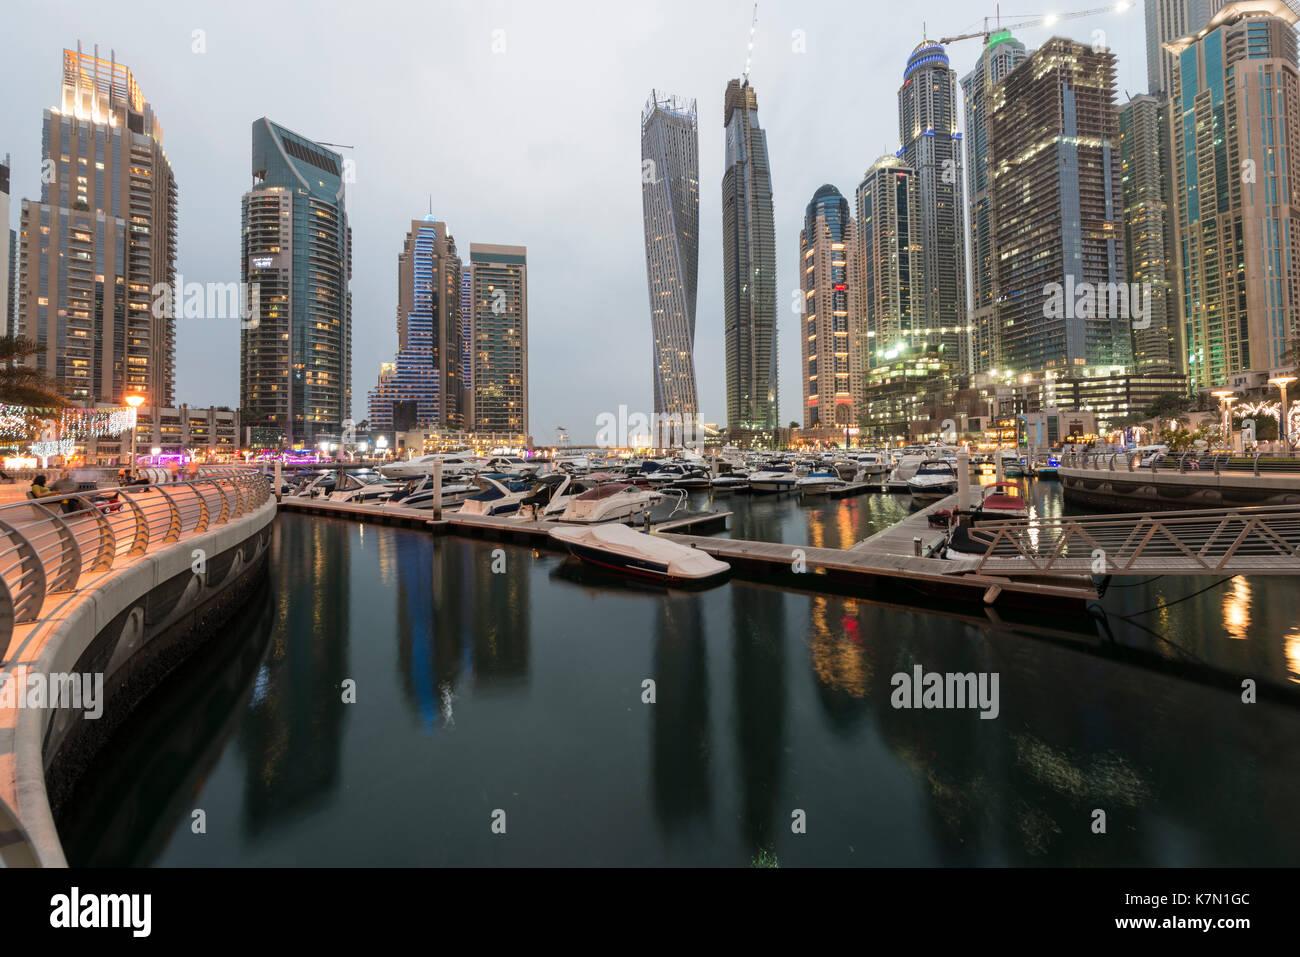 Marina, skyscraper at dusk, Dubai Marina, Dubai, United Arab Emirates - Stock Image